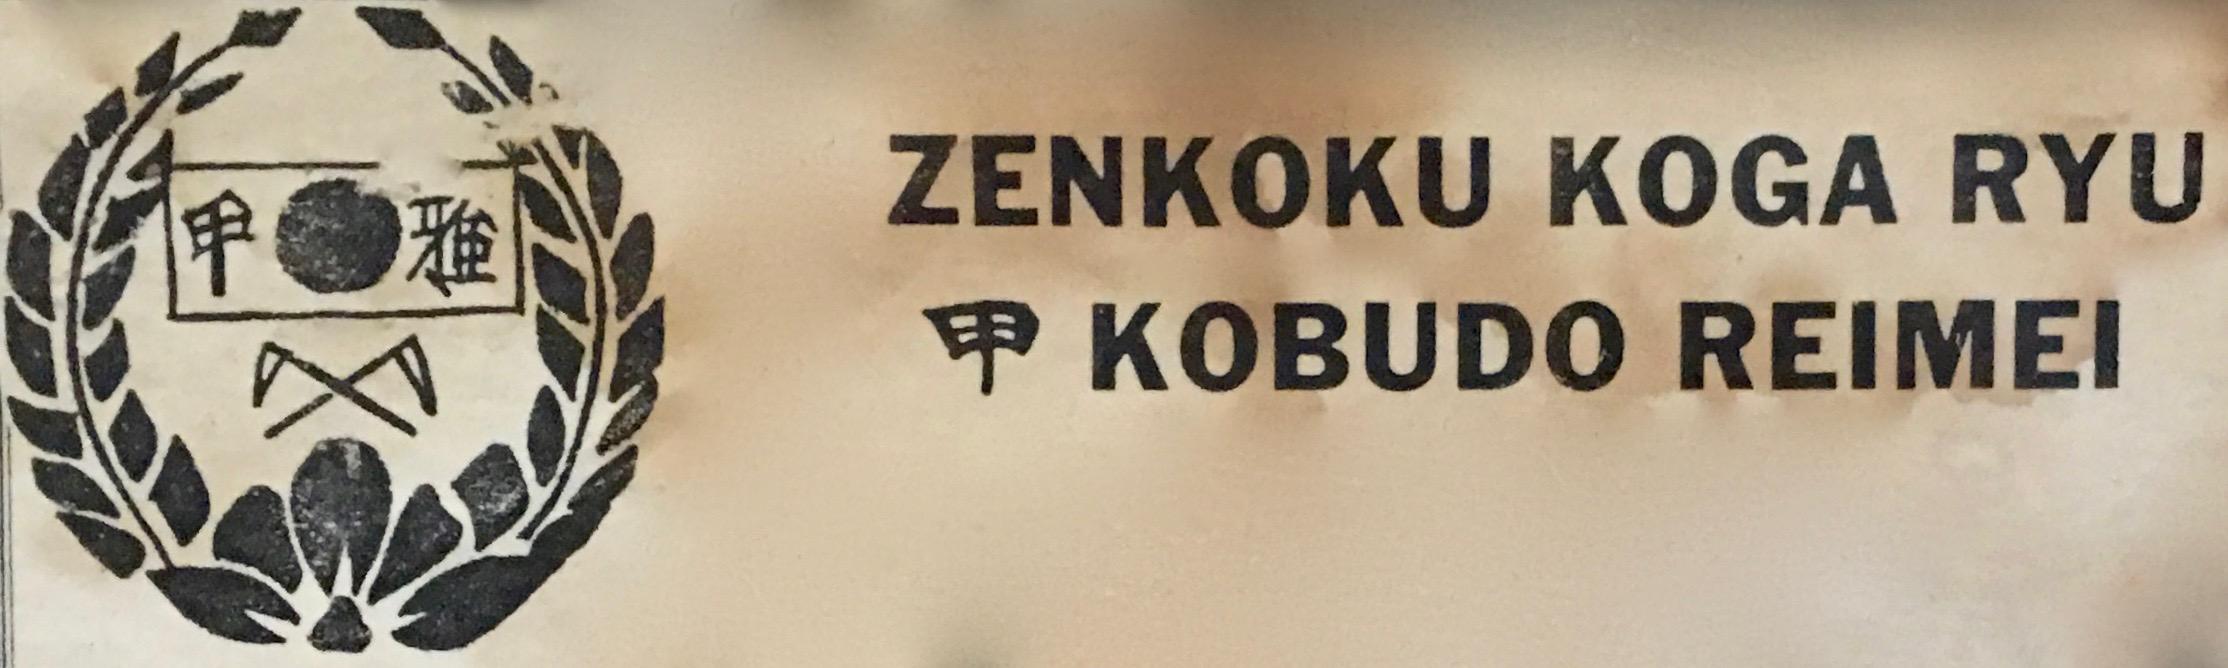 Zenkoku Koga Ryu Reimei Logo